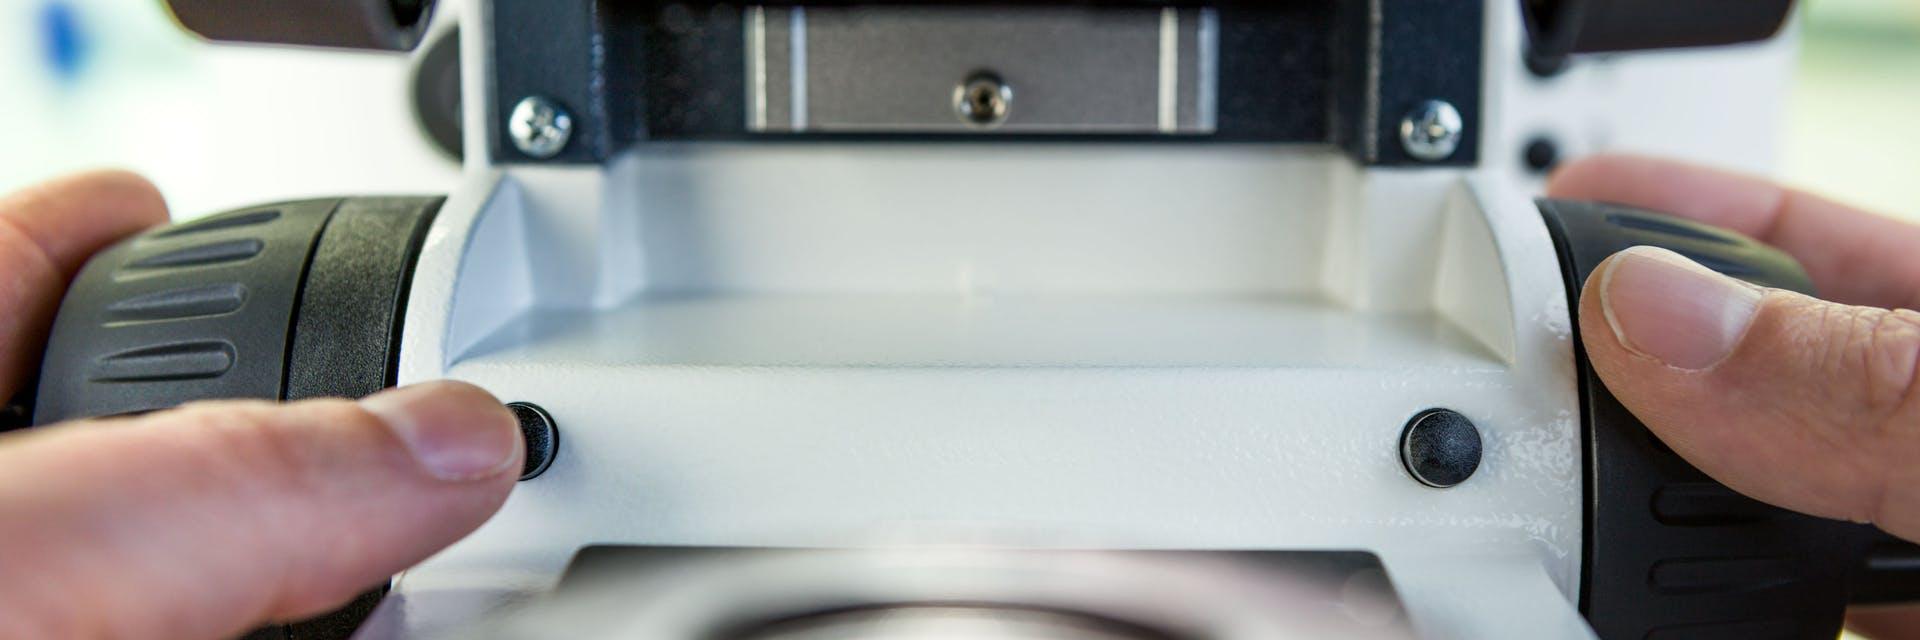 ZEISS luxoptic axioscope 5 smart microscope